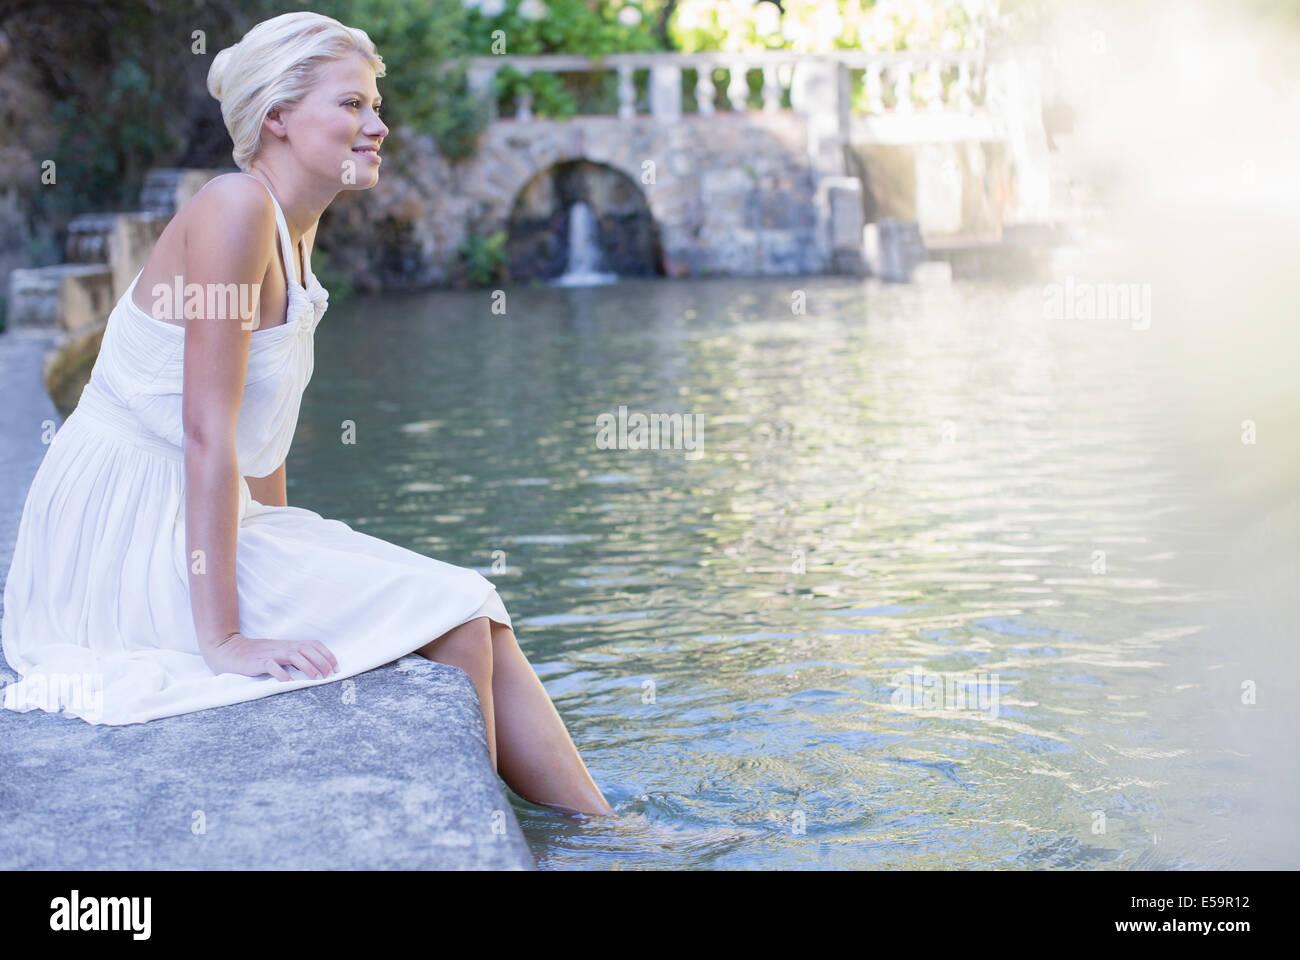 Frau baumelnden Füße im pool Stockbild